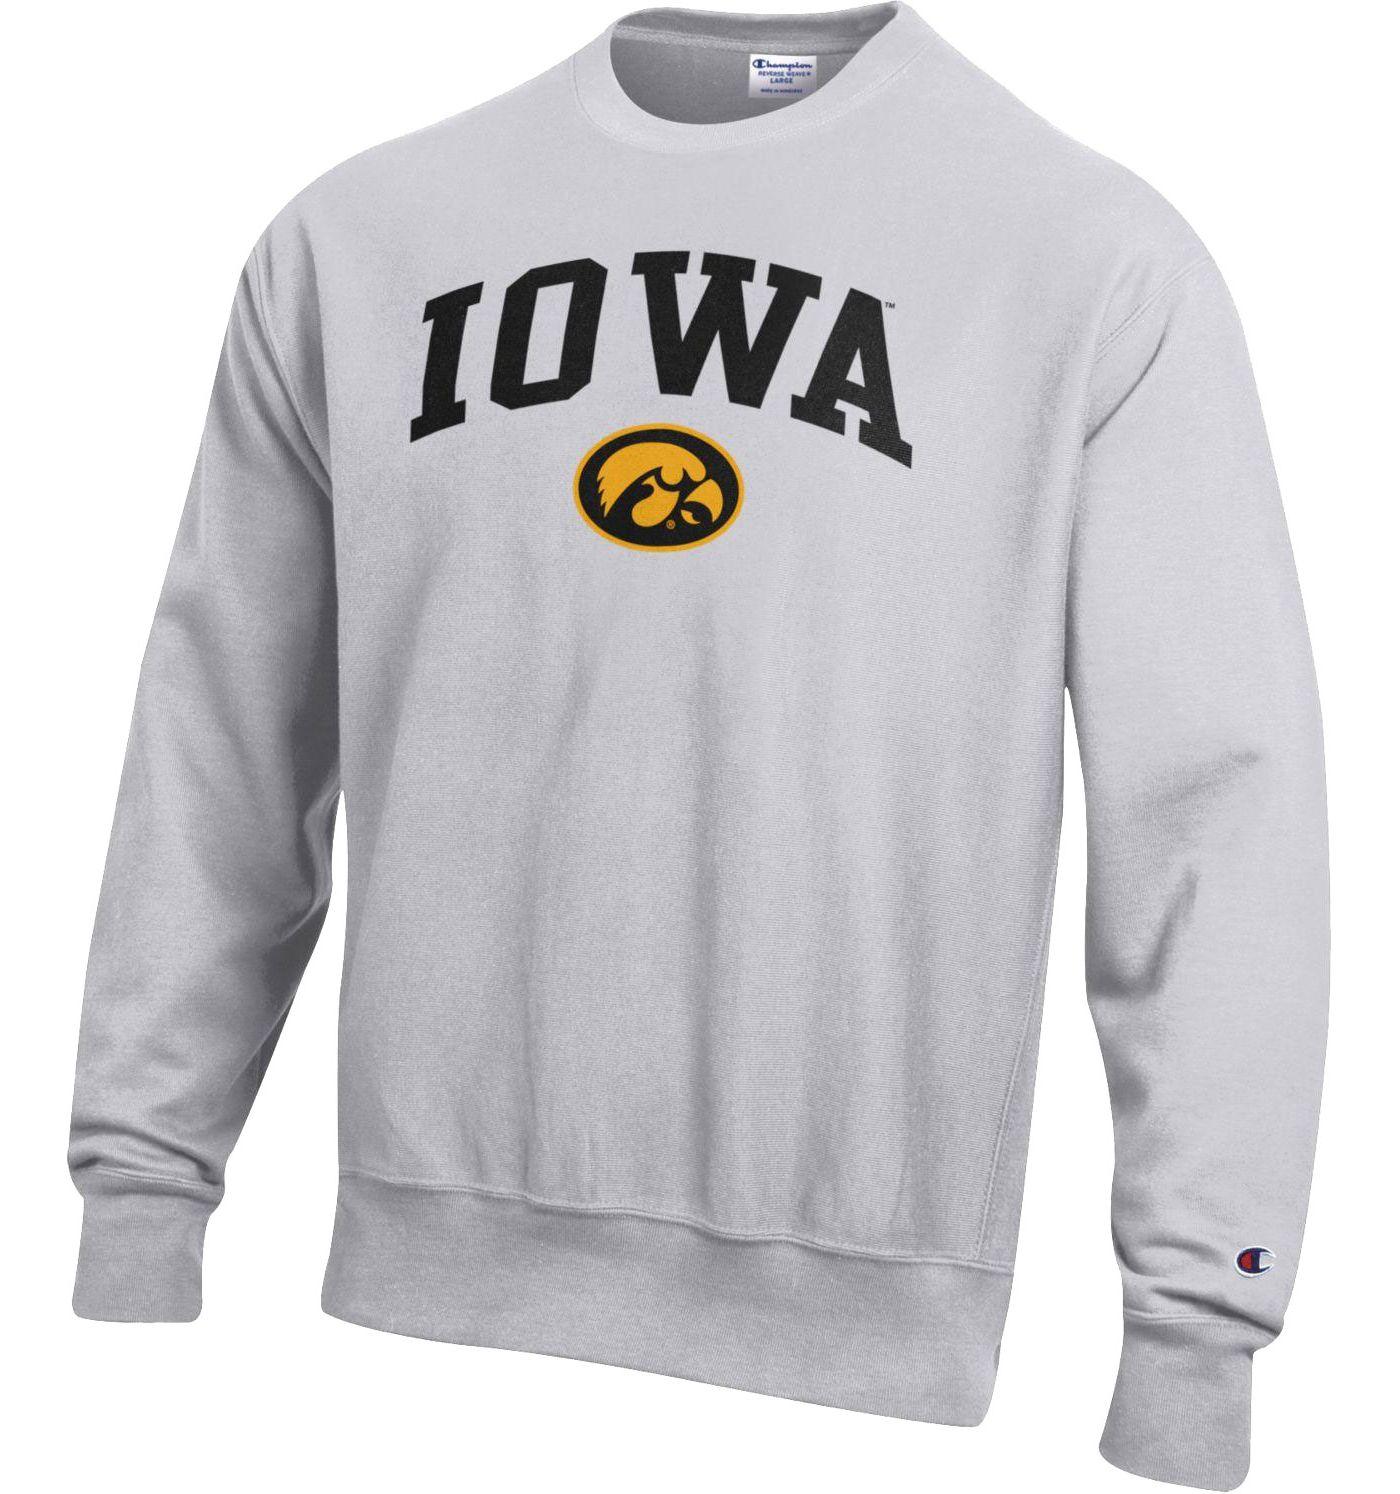 Champion Men's Iowa Hawkeyes Grey Reverse Weave Crew Sweatshirt